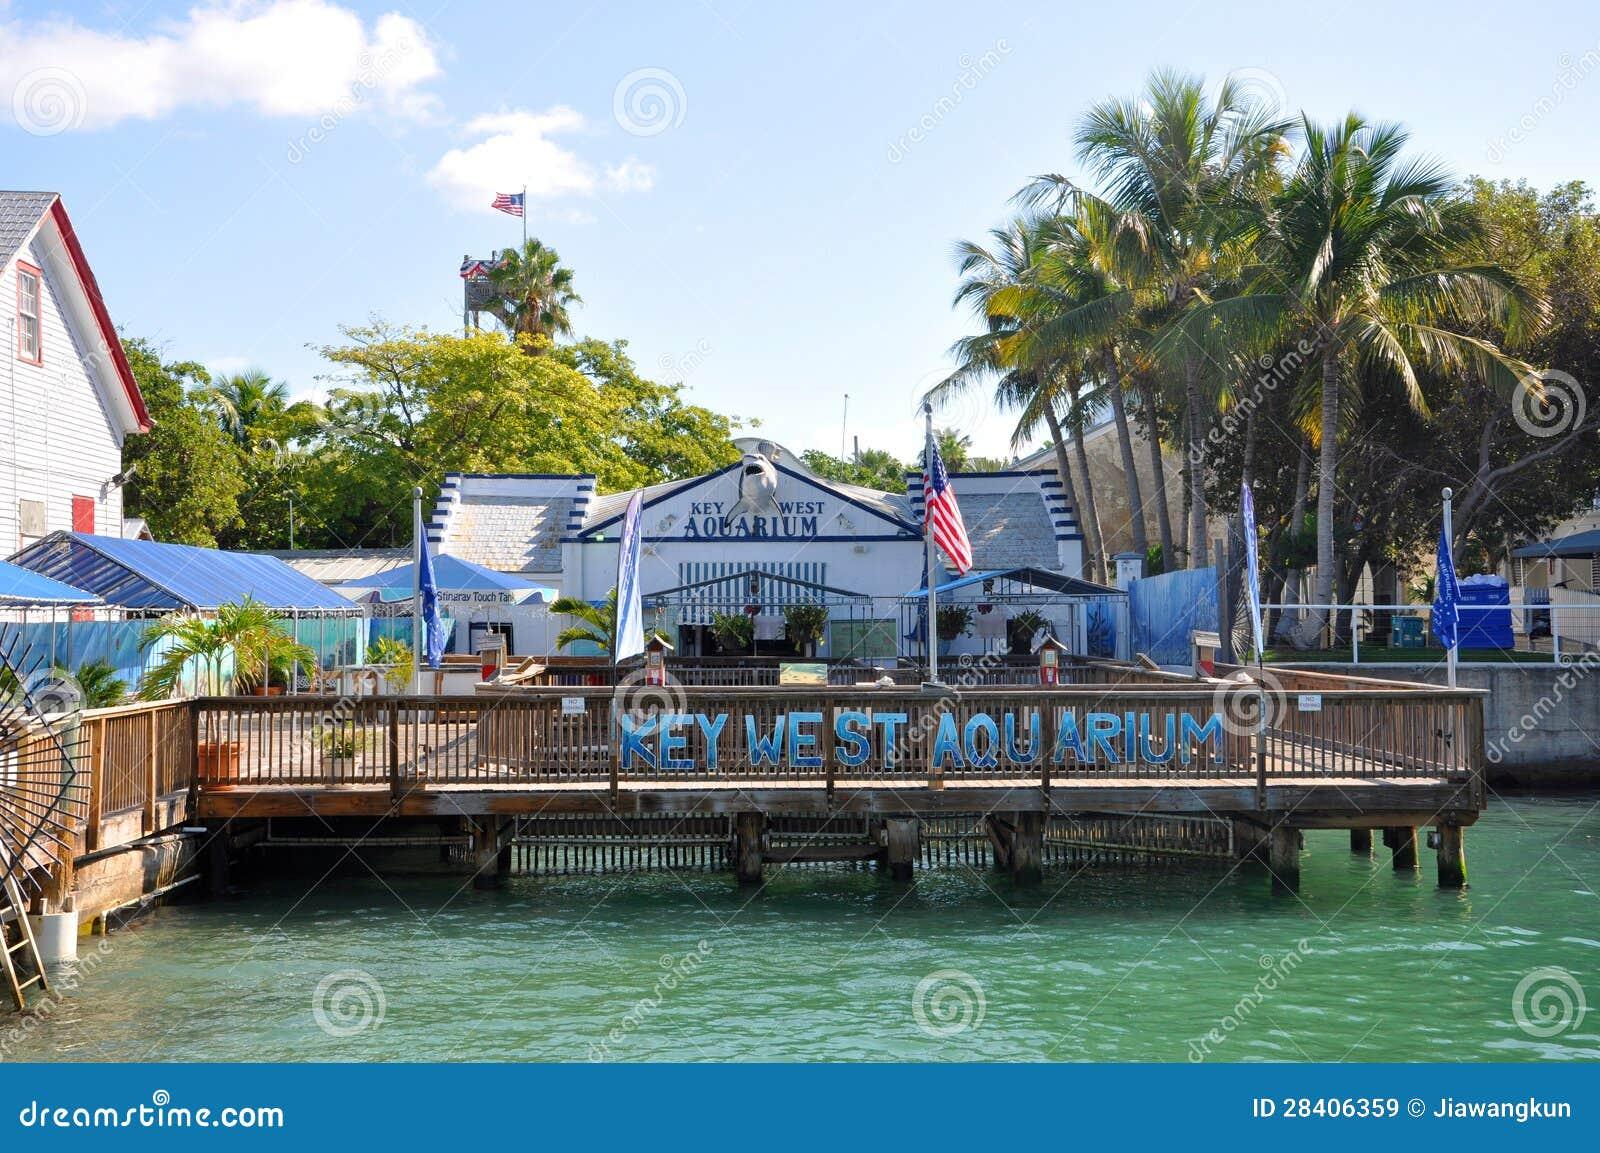 Key West Web Design